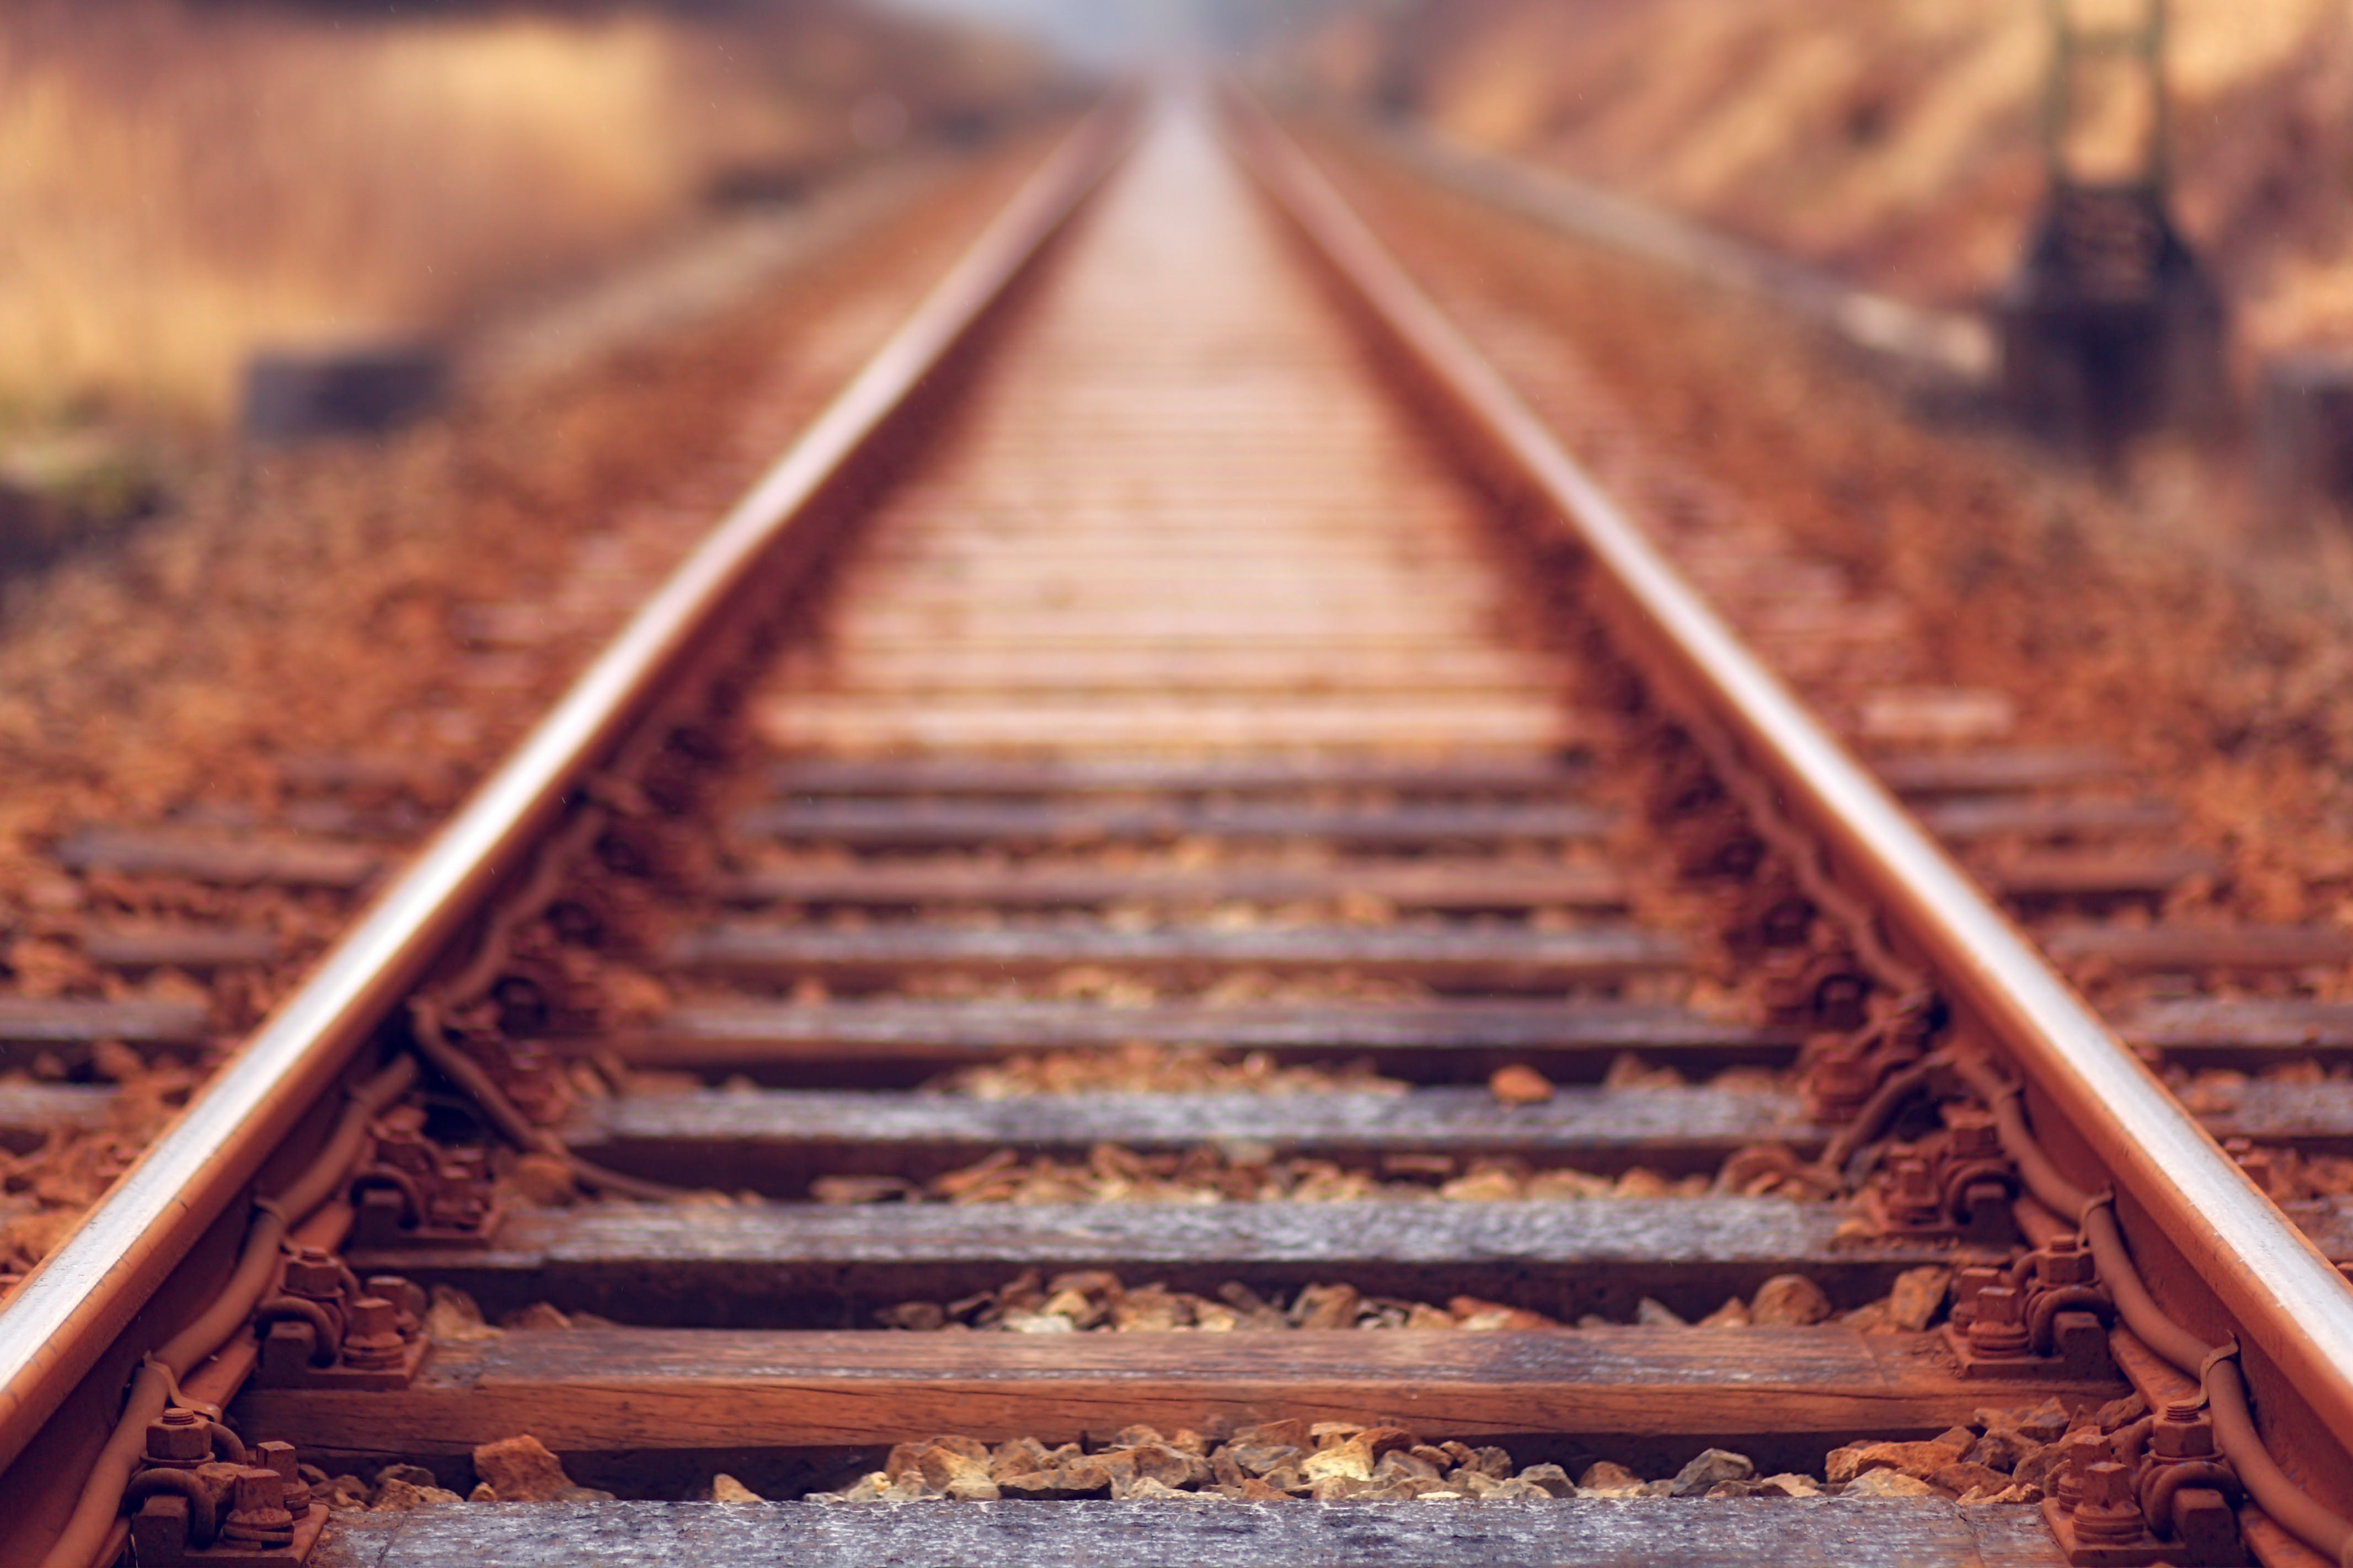 Shallow Focus Photo of Train Rail